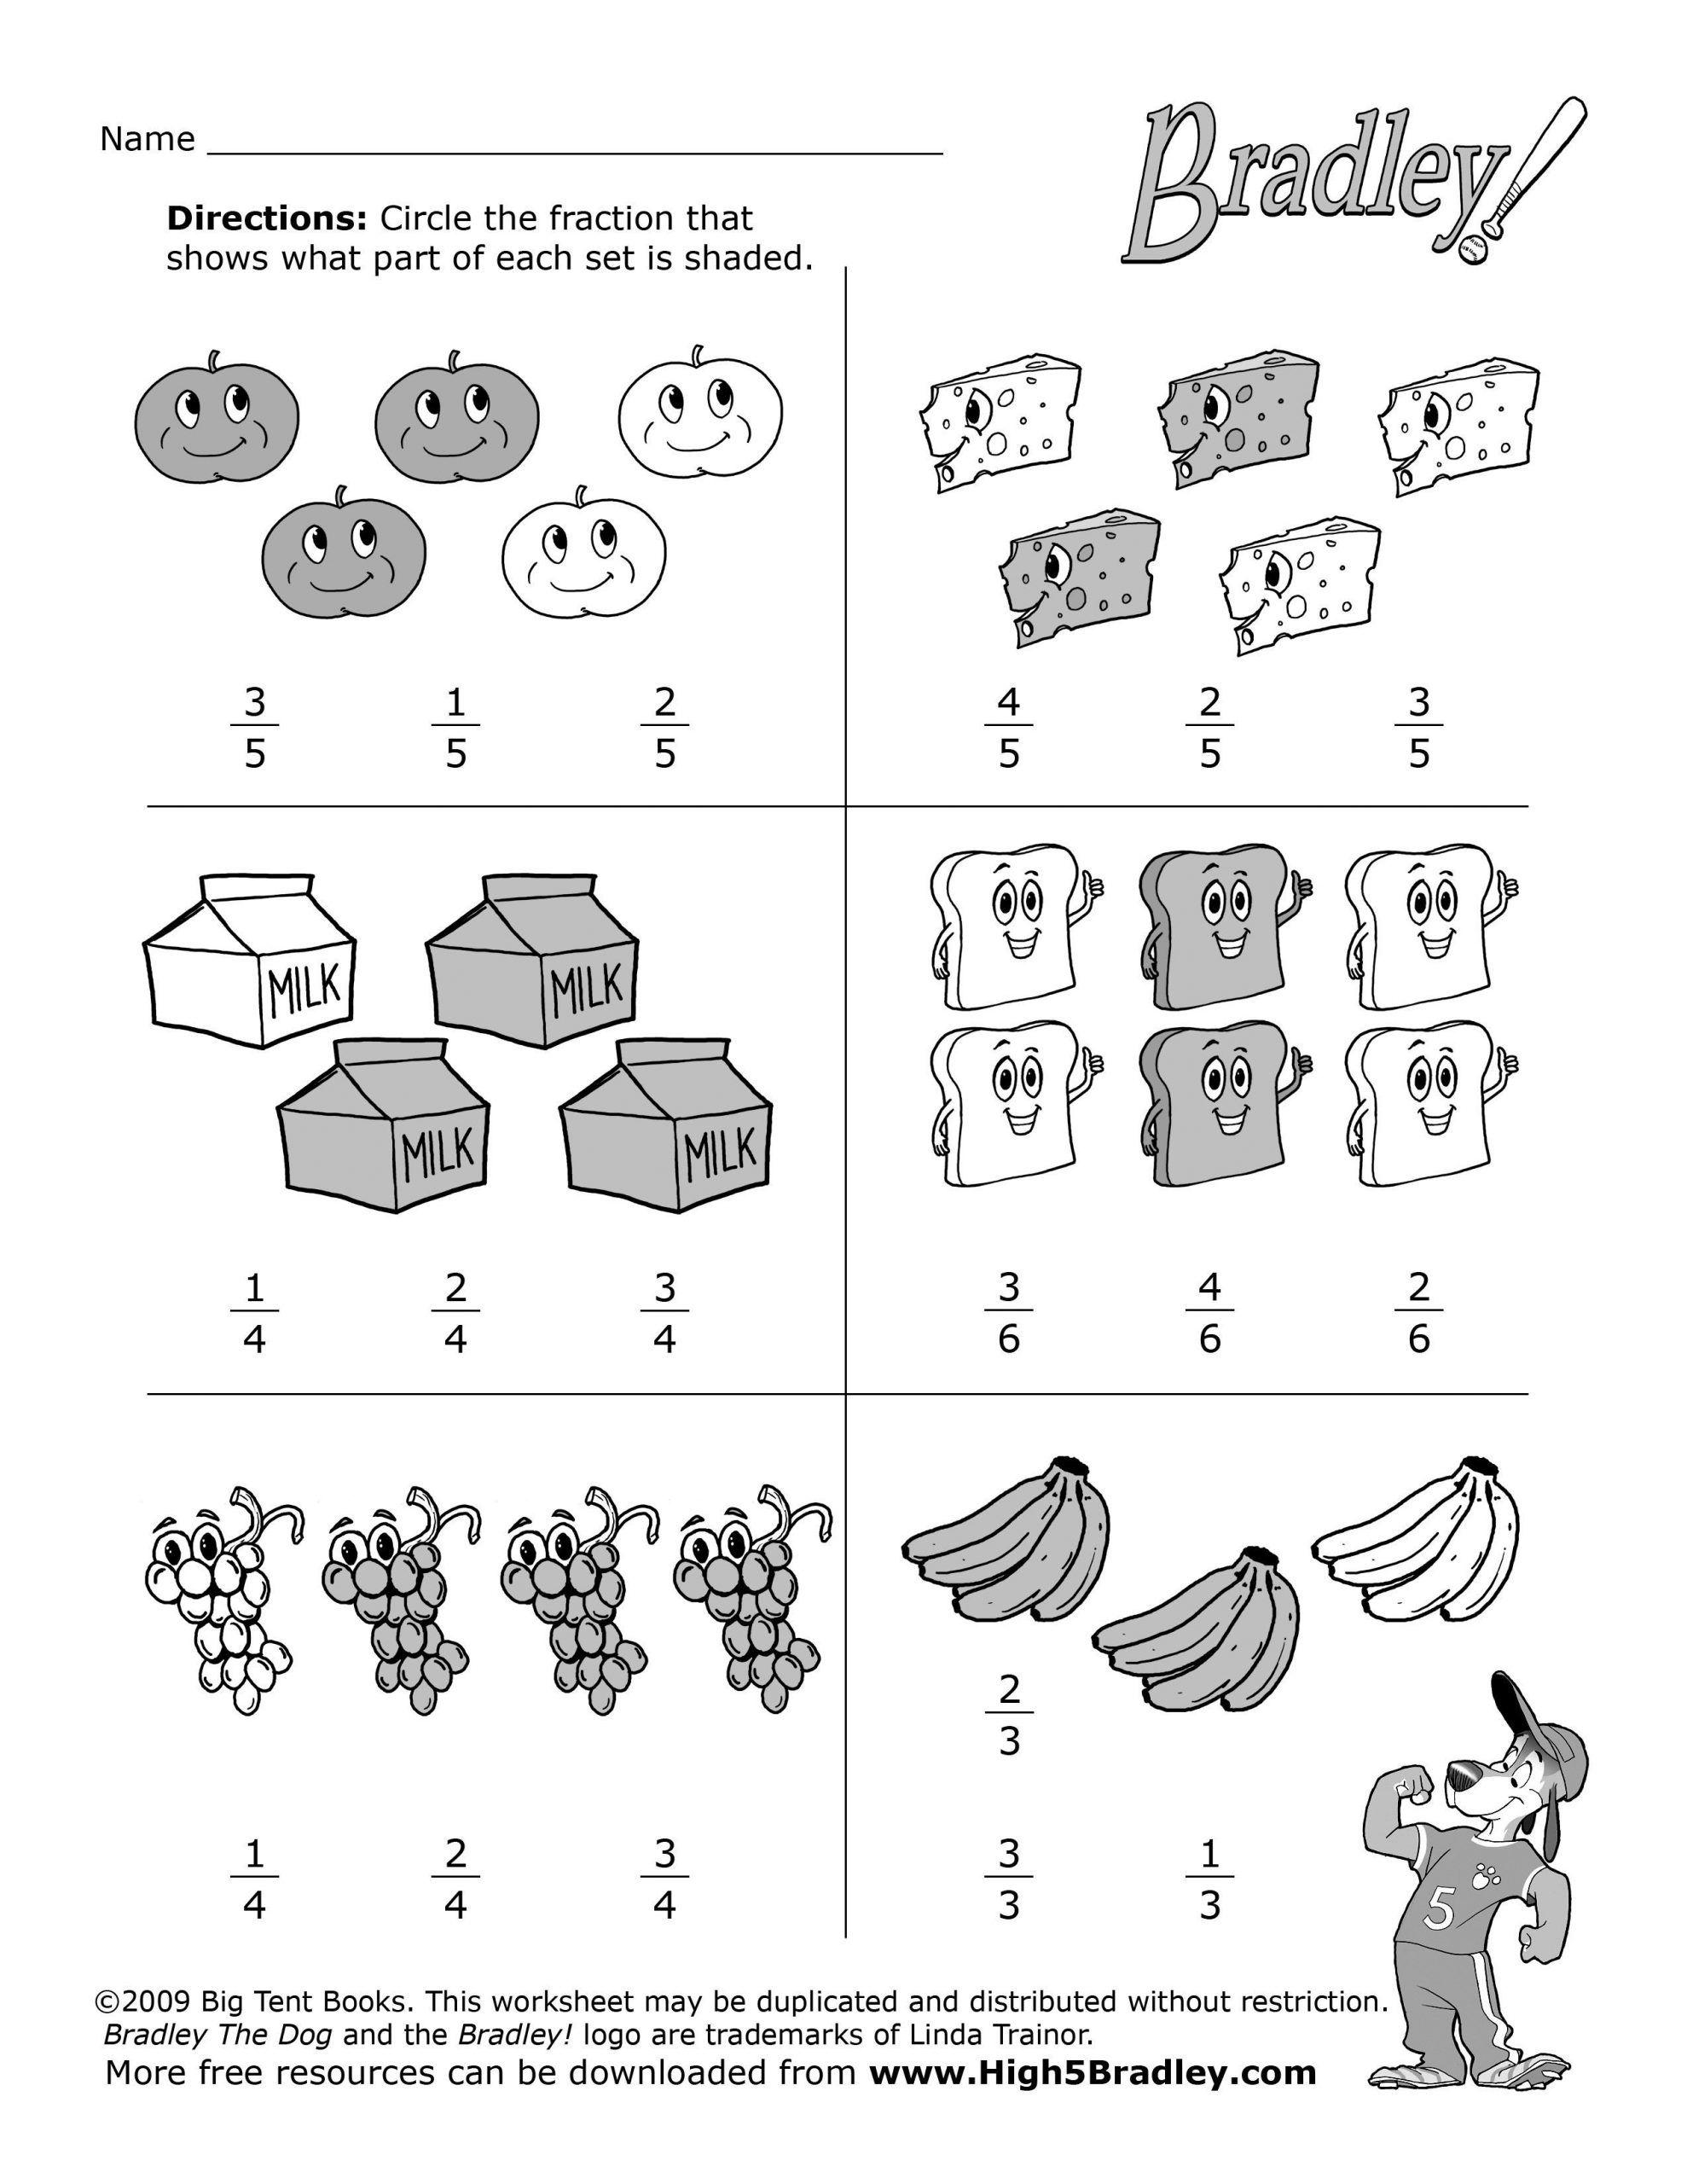 Fractions Worksheets 2nd Grade 2nd Grade Math Food Fractions1 2 550 3 300 Pixels In 2021 Fractions Worksheets 2nd Grade Math Worksheets Fun Math Worksheets